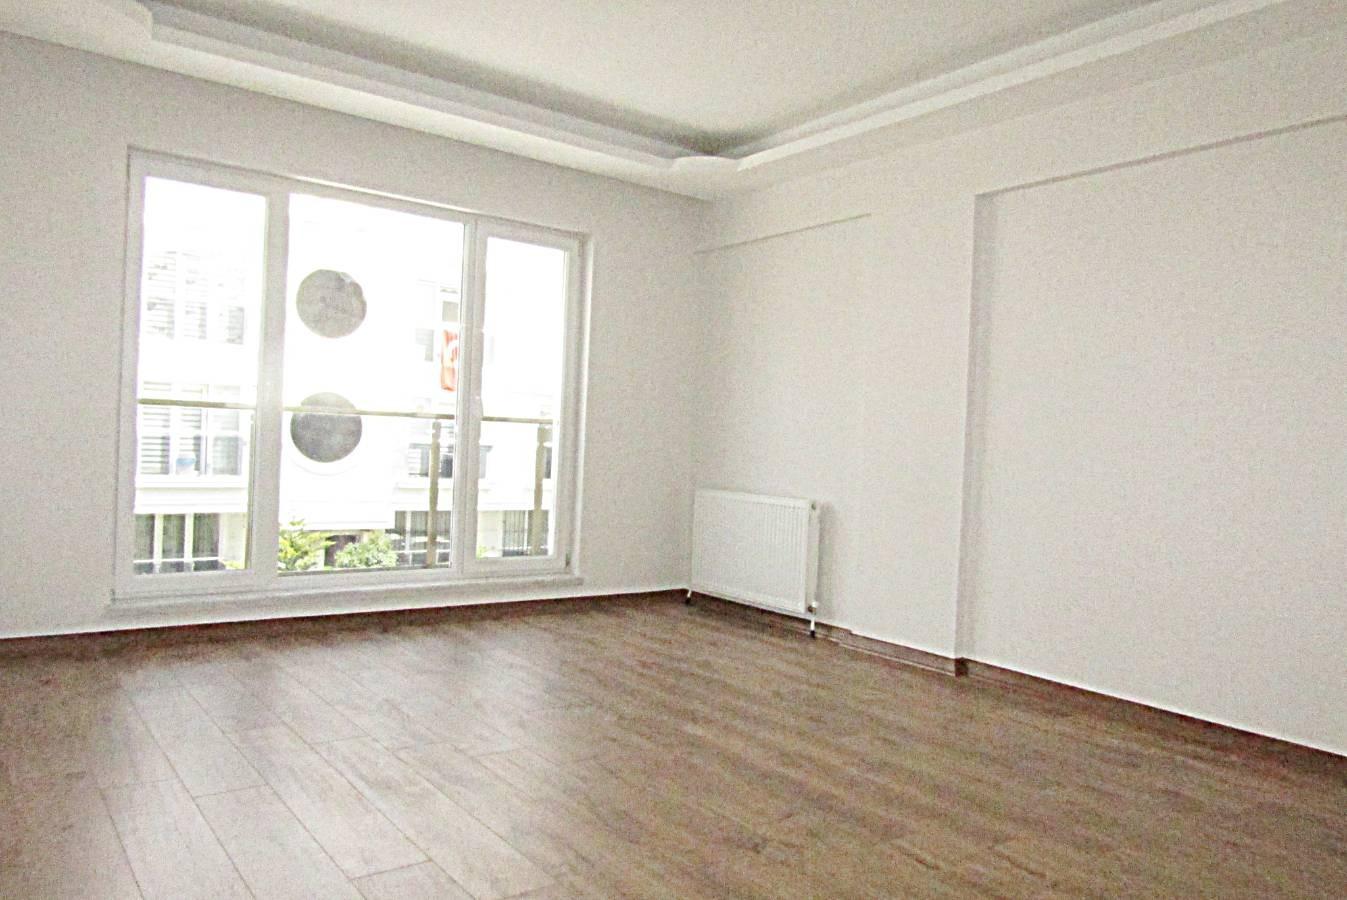 SR EMLAK'TAN İSTASYON  MAH'DE 4+1 185 m² FULL YAPILI EBEVEYN BANYOLU SIFIR  KAPALI TERAS